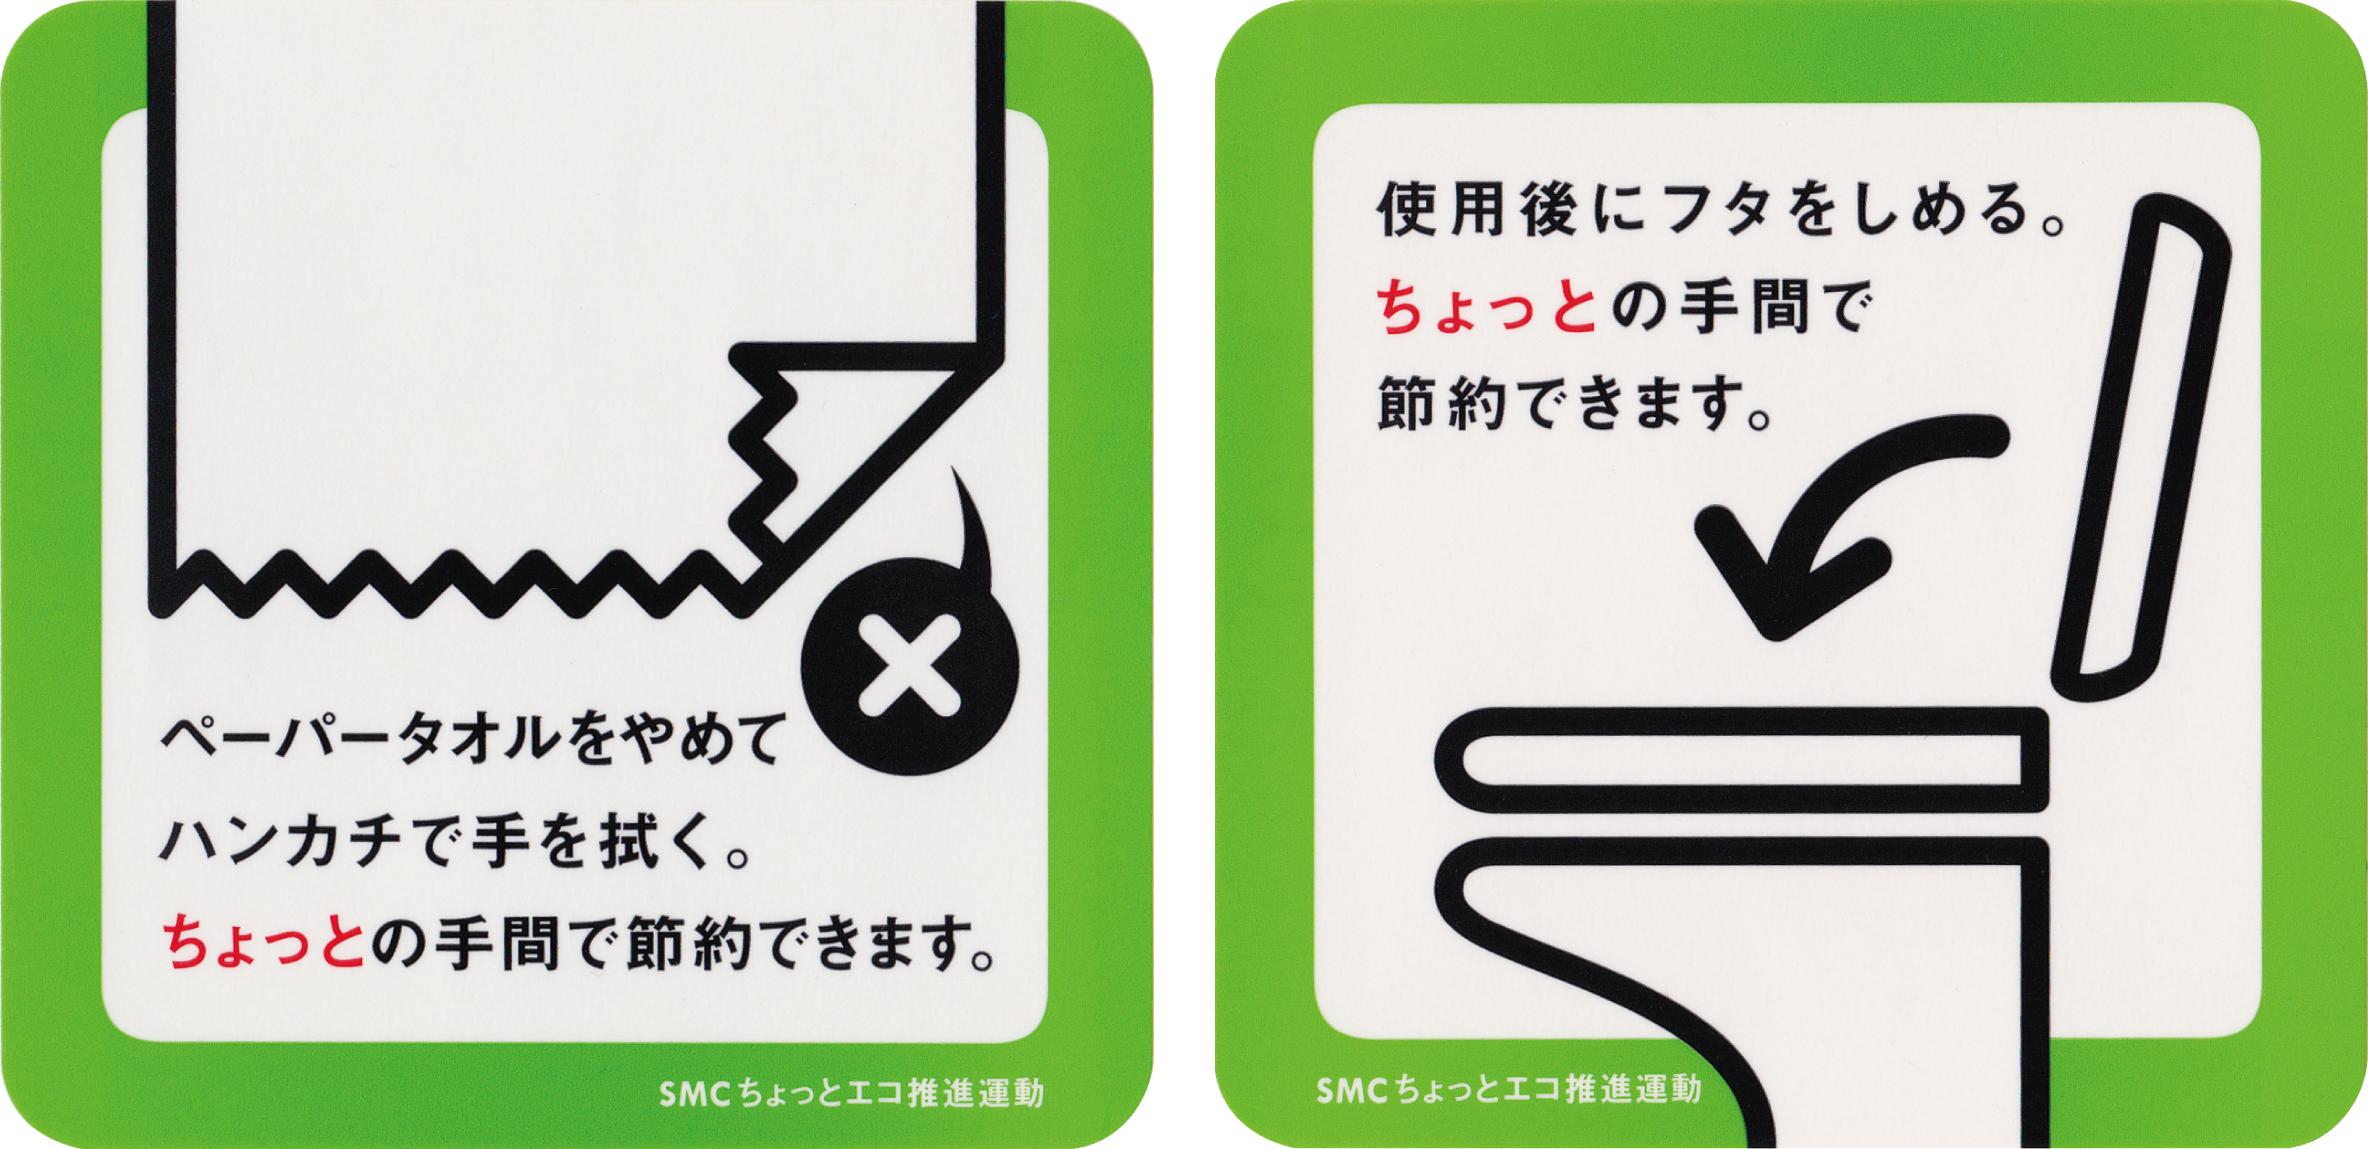 eco_04.jpg